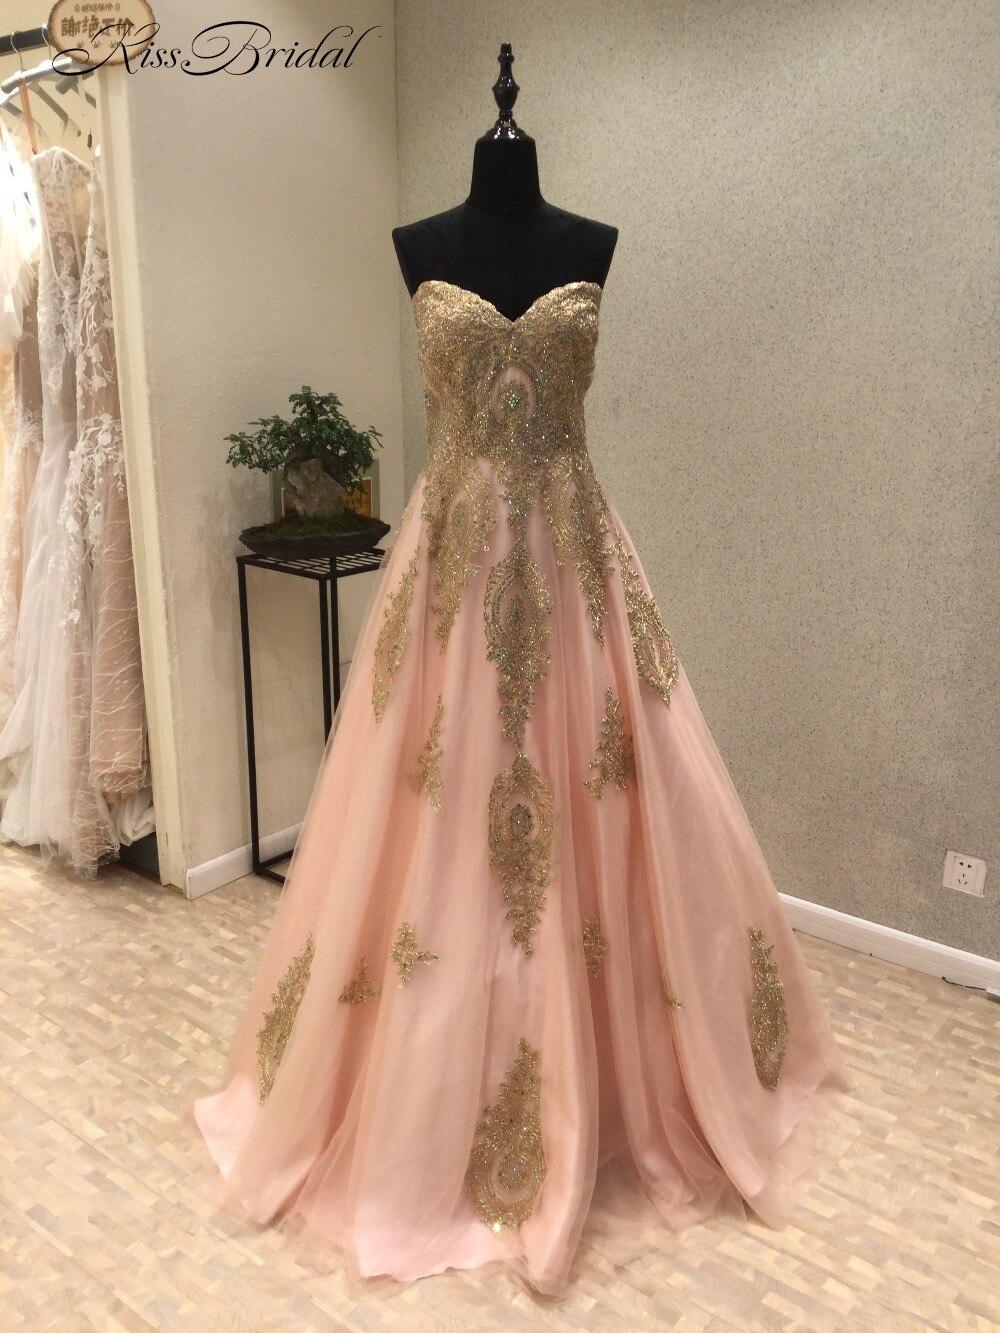 New Arrival 2017   Prom     Dresses   2018 Sweetheart Off the Shoulder A-Line Appliques Tulle Evening   Dresses   vestido longo de festa